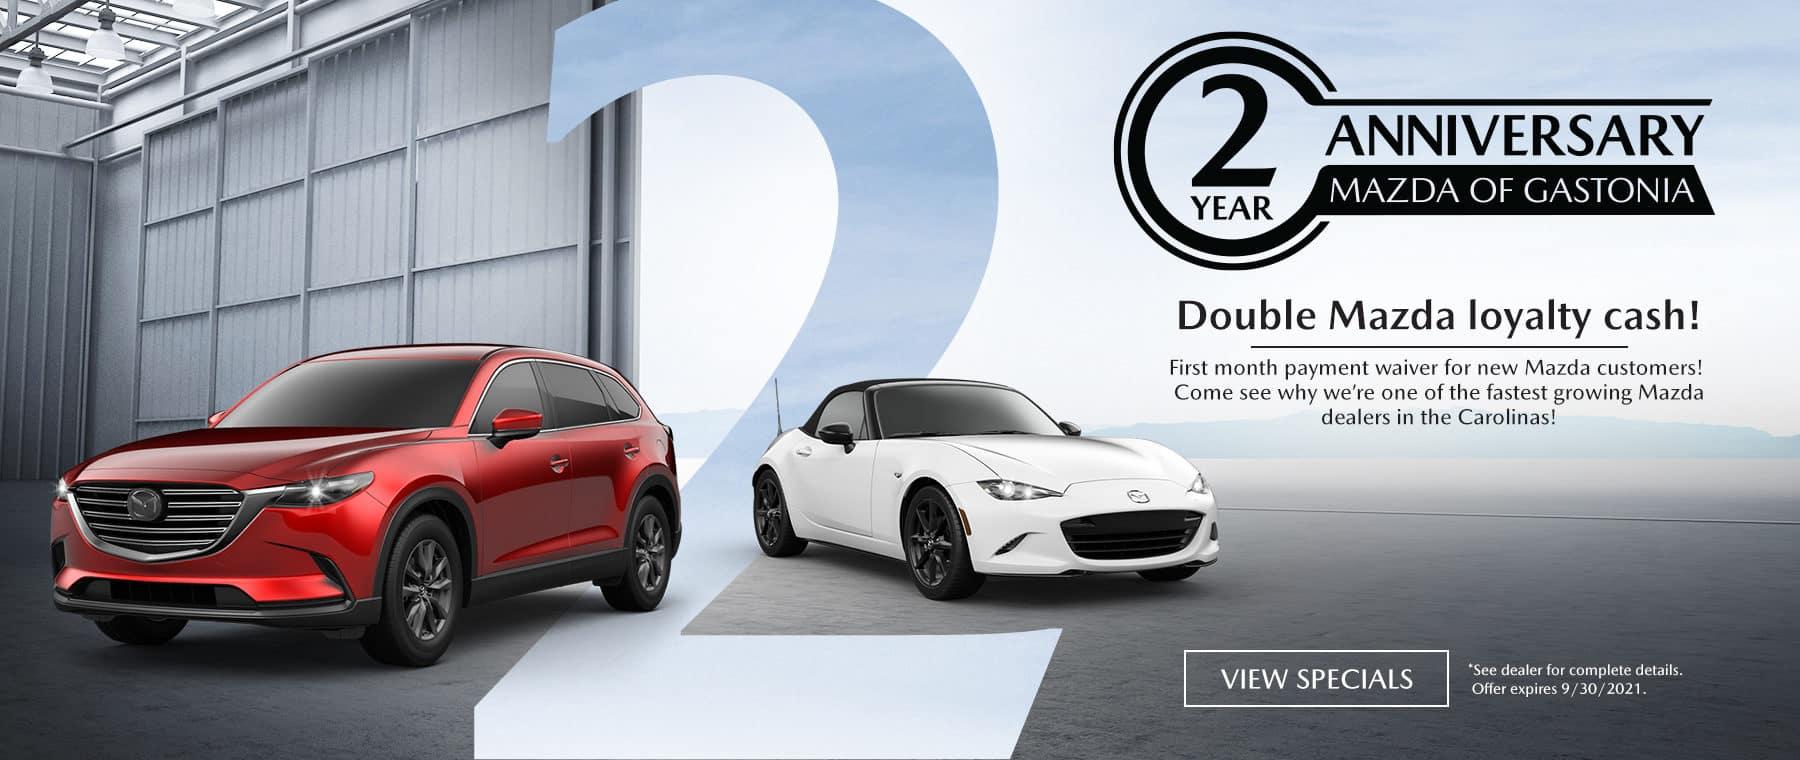 MazdaGastonia_SeptemberBranding-Slide_1800x760_09-21_Anniversary_FINAL